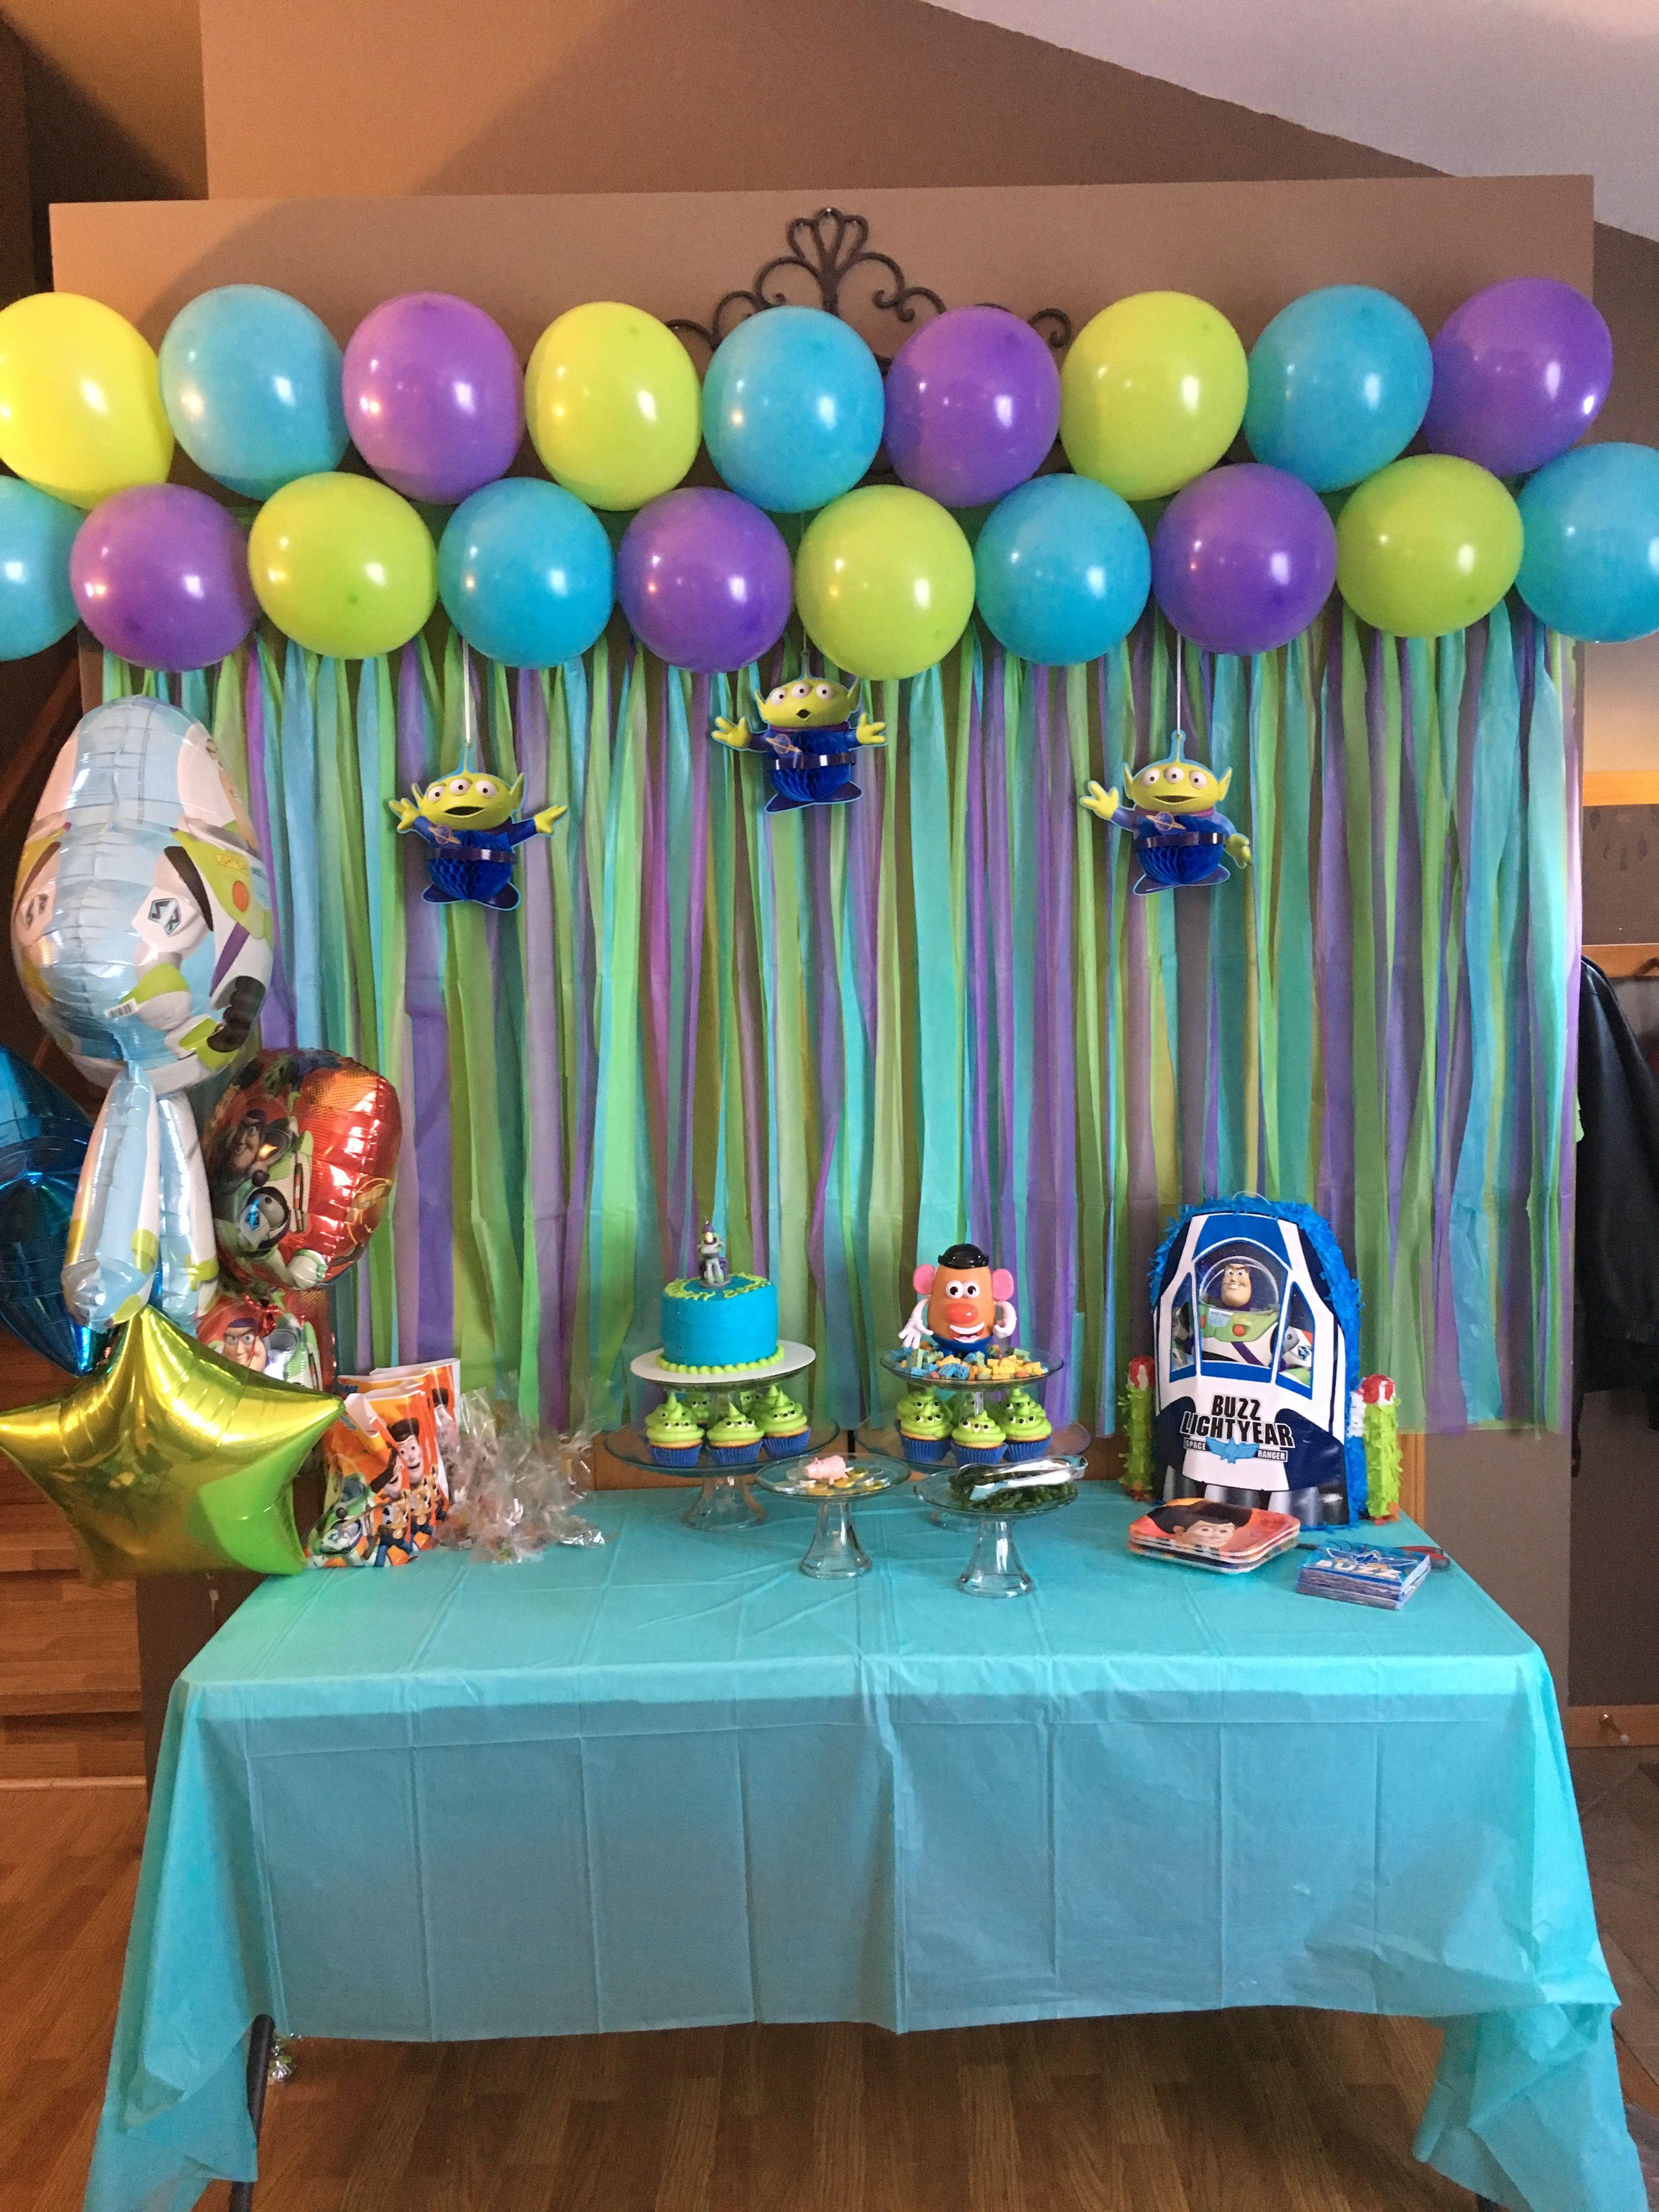 Toy Story Buzz Lightyear Party In 2019 Toy Story Birthday